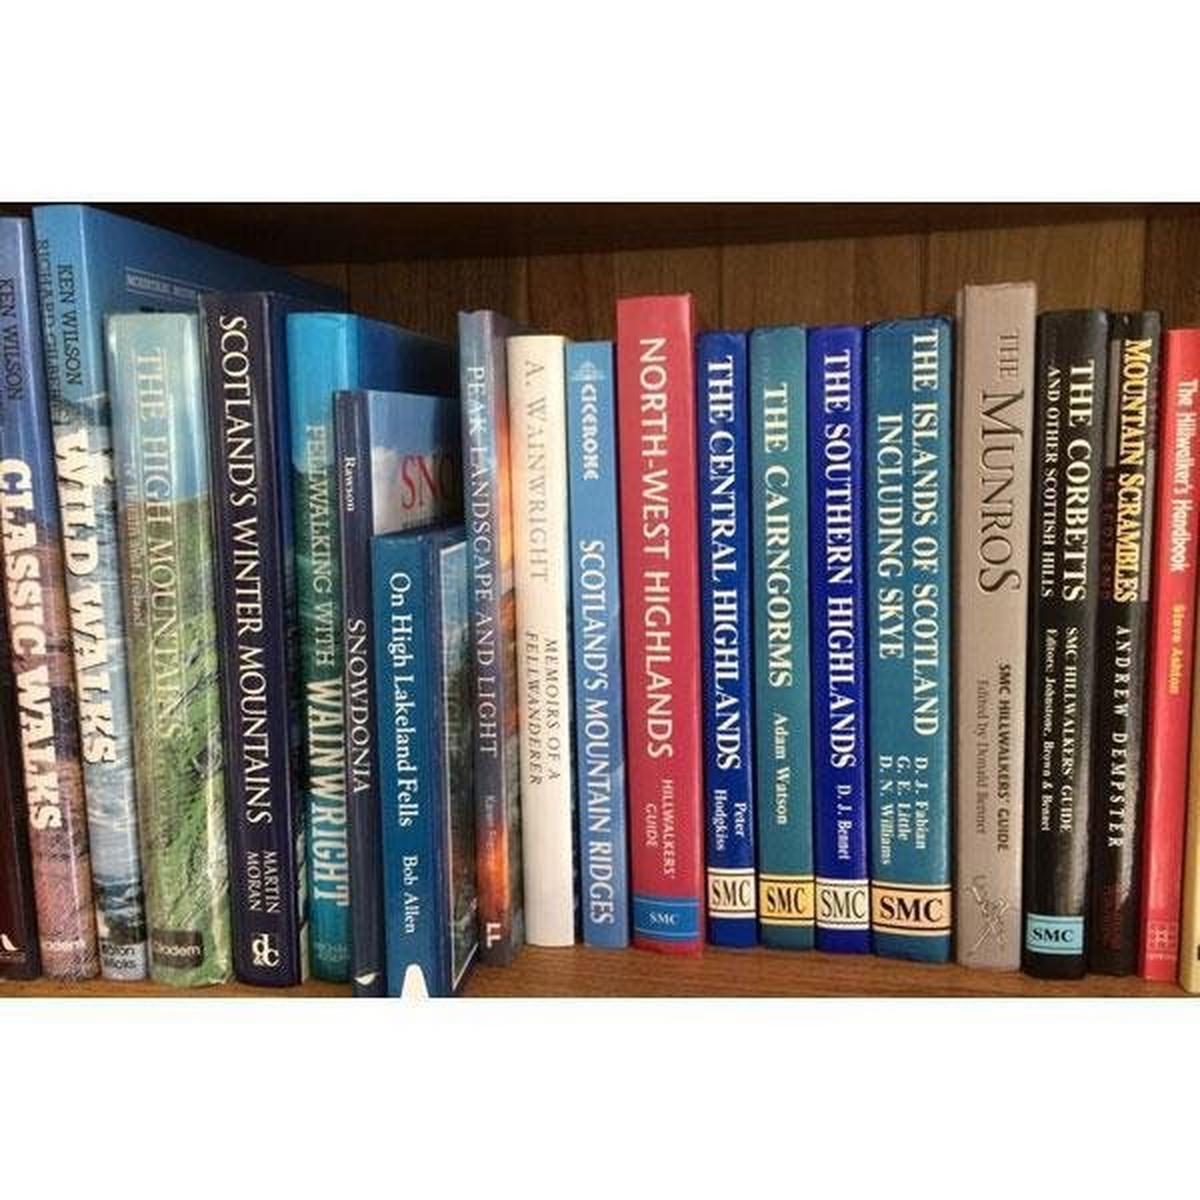 Cordee SMC Climbing Guide Book: Scottish Rock Climbs